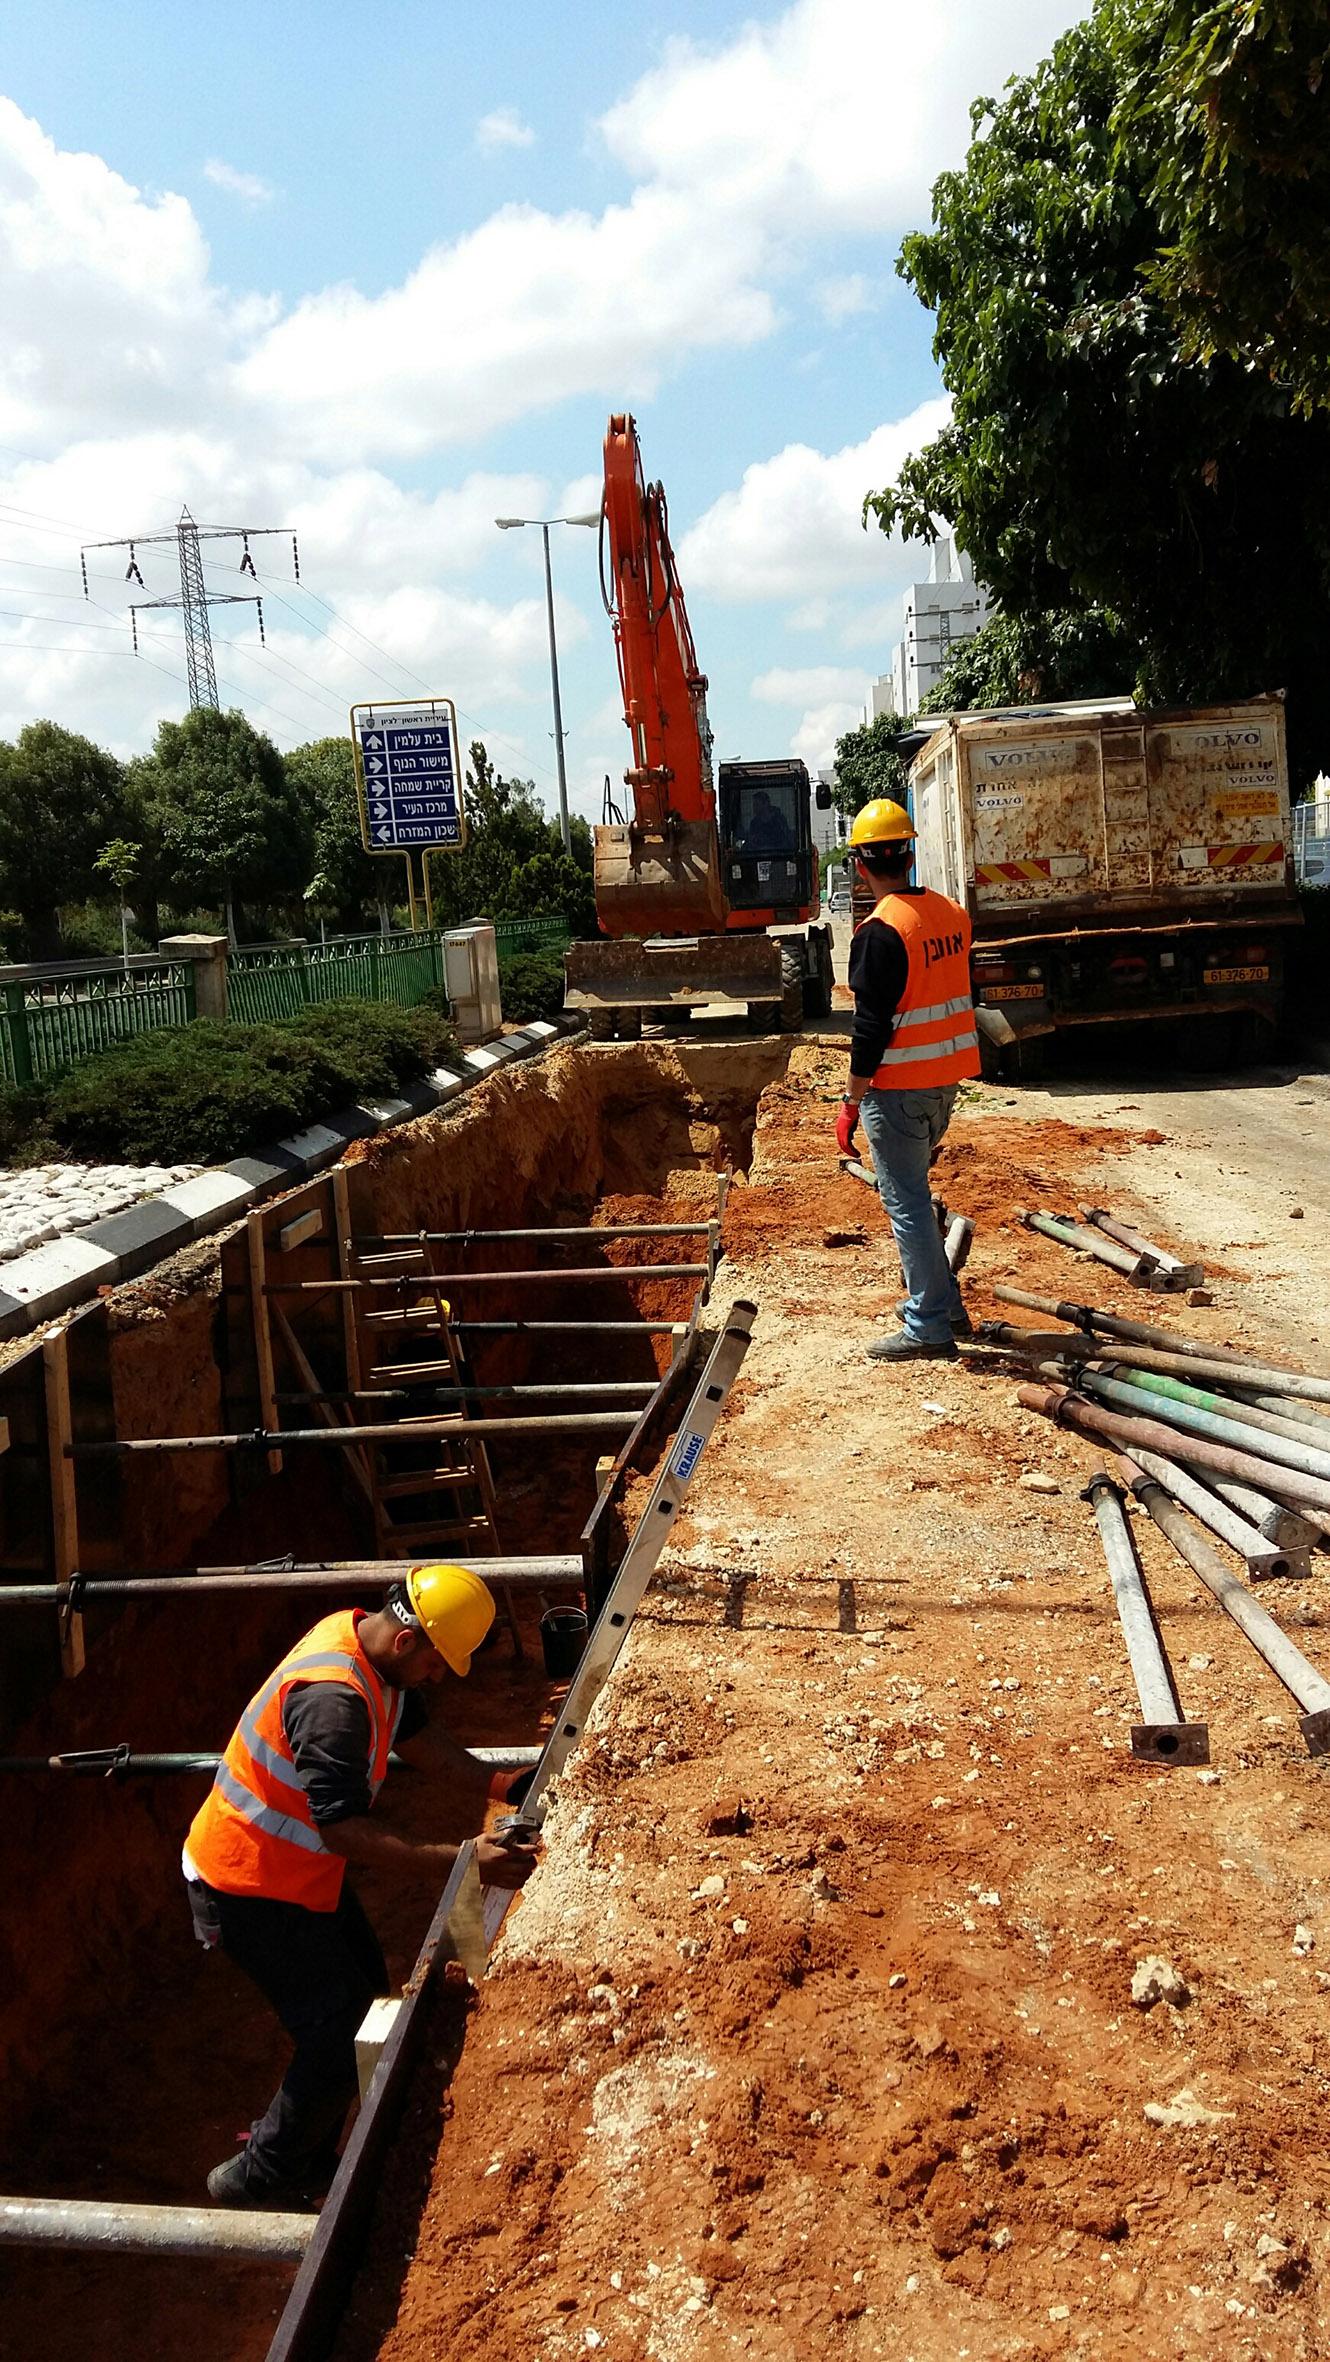 Photo of הושלם: הסתיימו העבודות להטמנת  קו המתח ברחוב יגאל אלון בראשון לציון